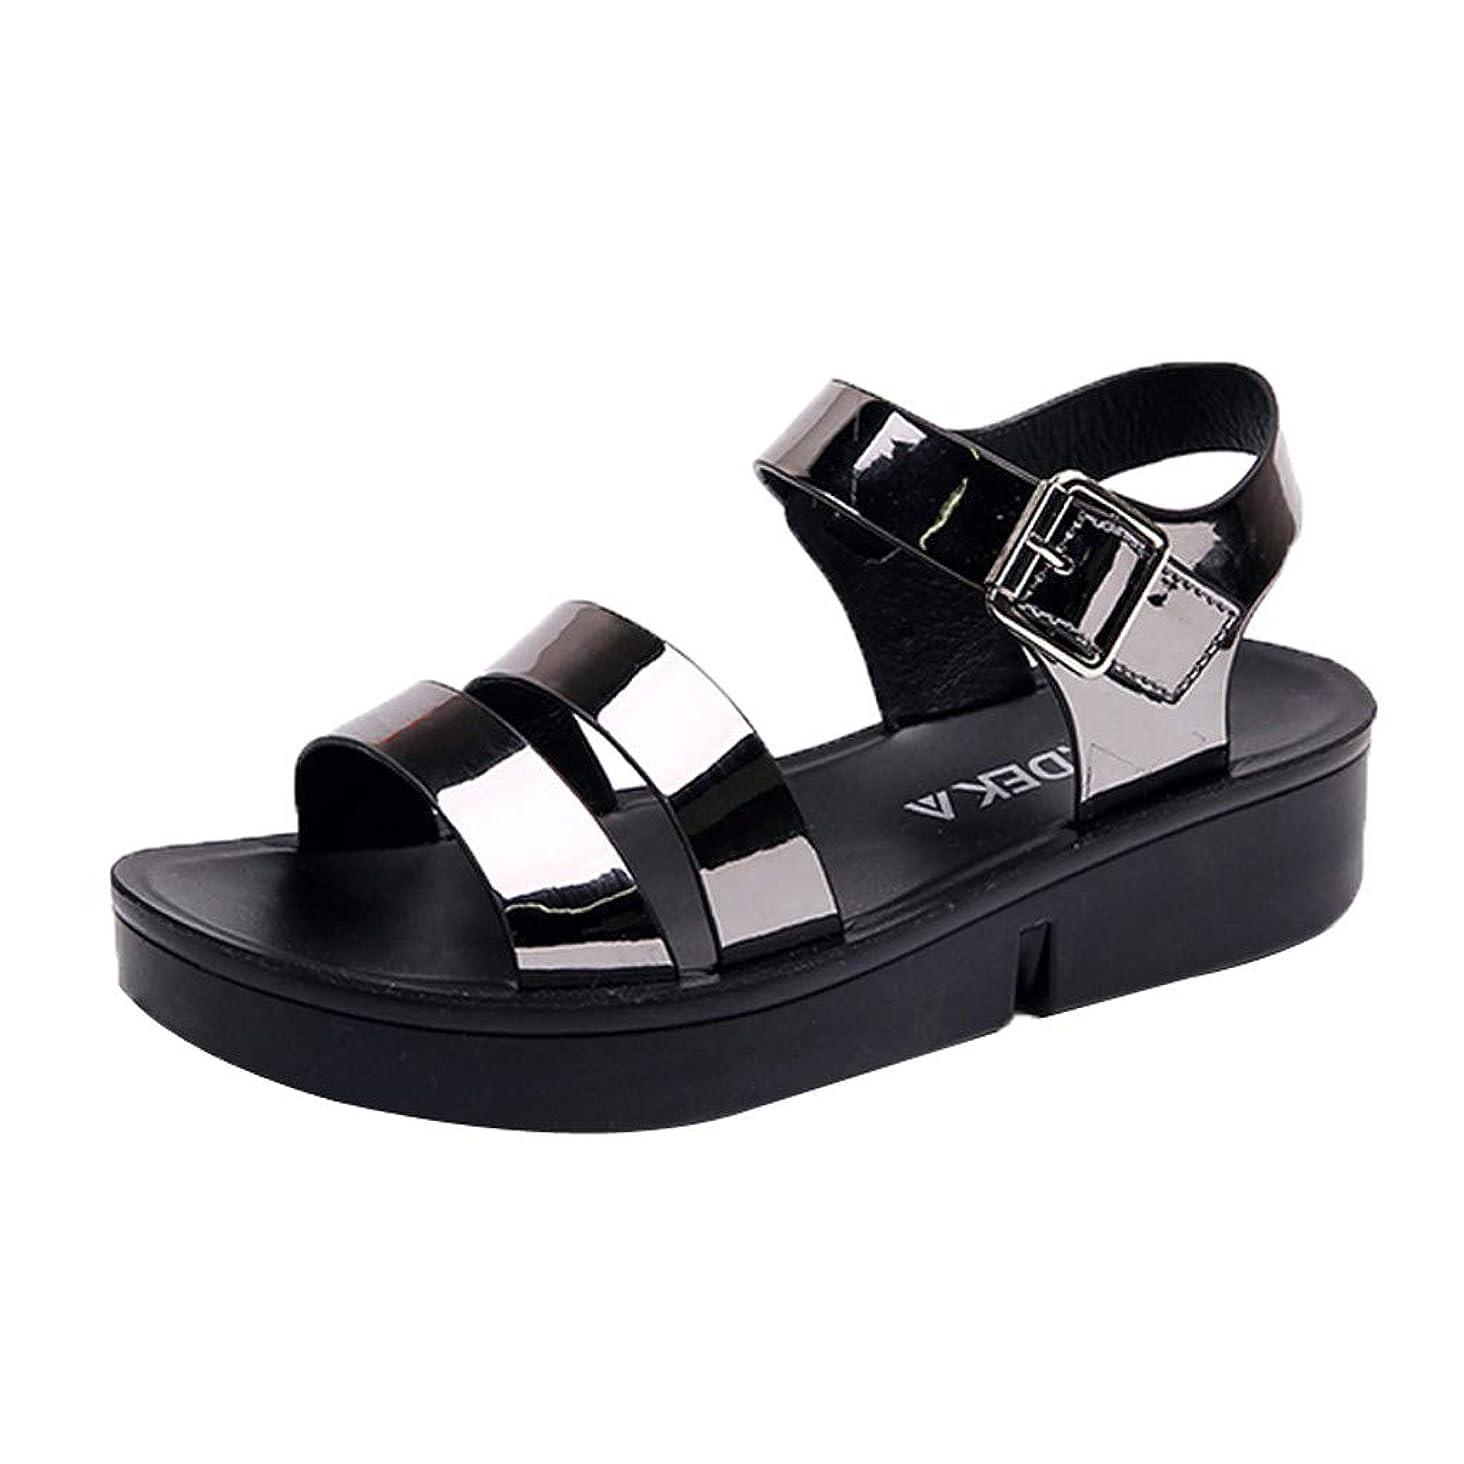 Toimothcn Women's Beach Sandals Summer Casual Thick Botton Flat Sandals Buckle Ankle Strap Dress Shoes